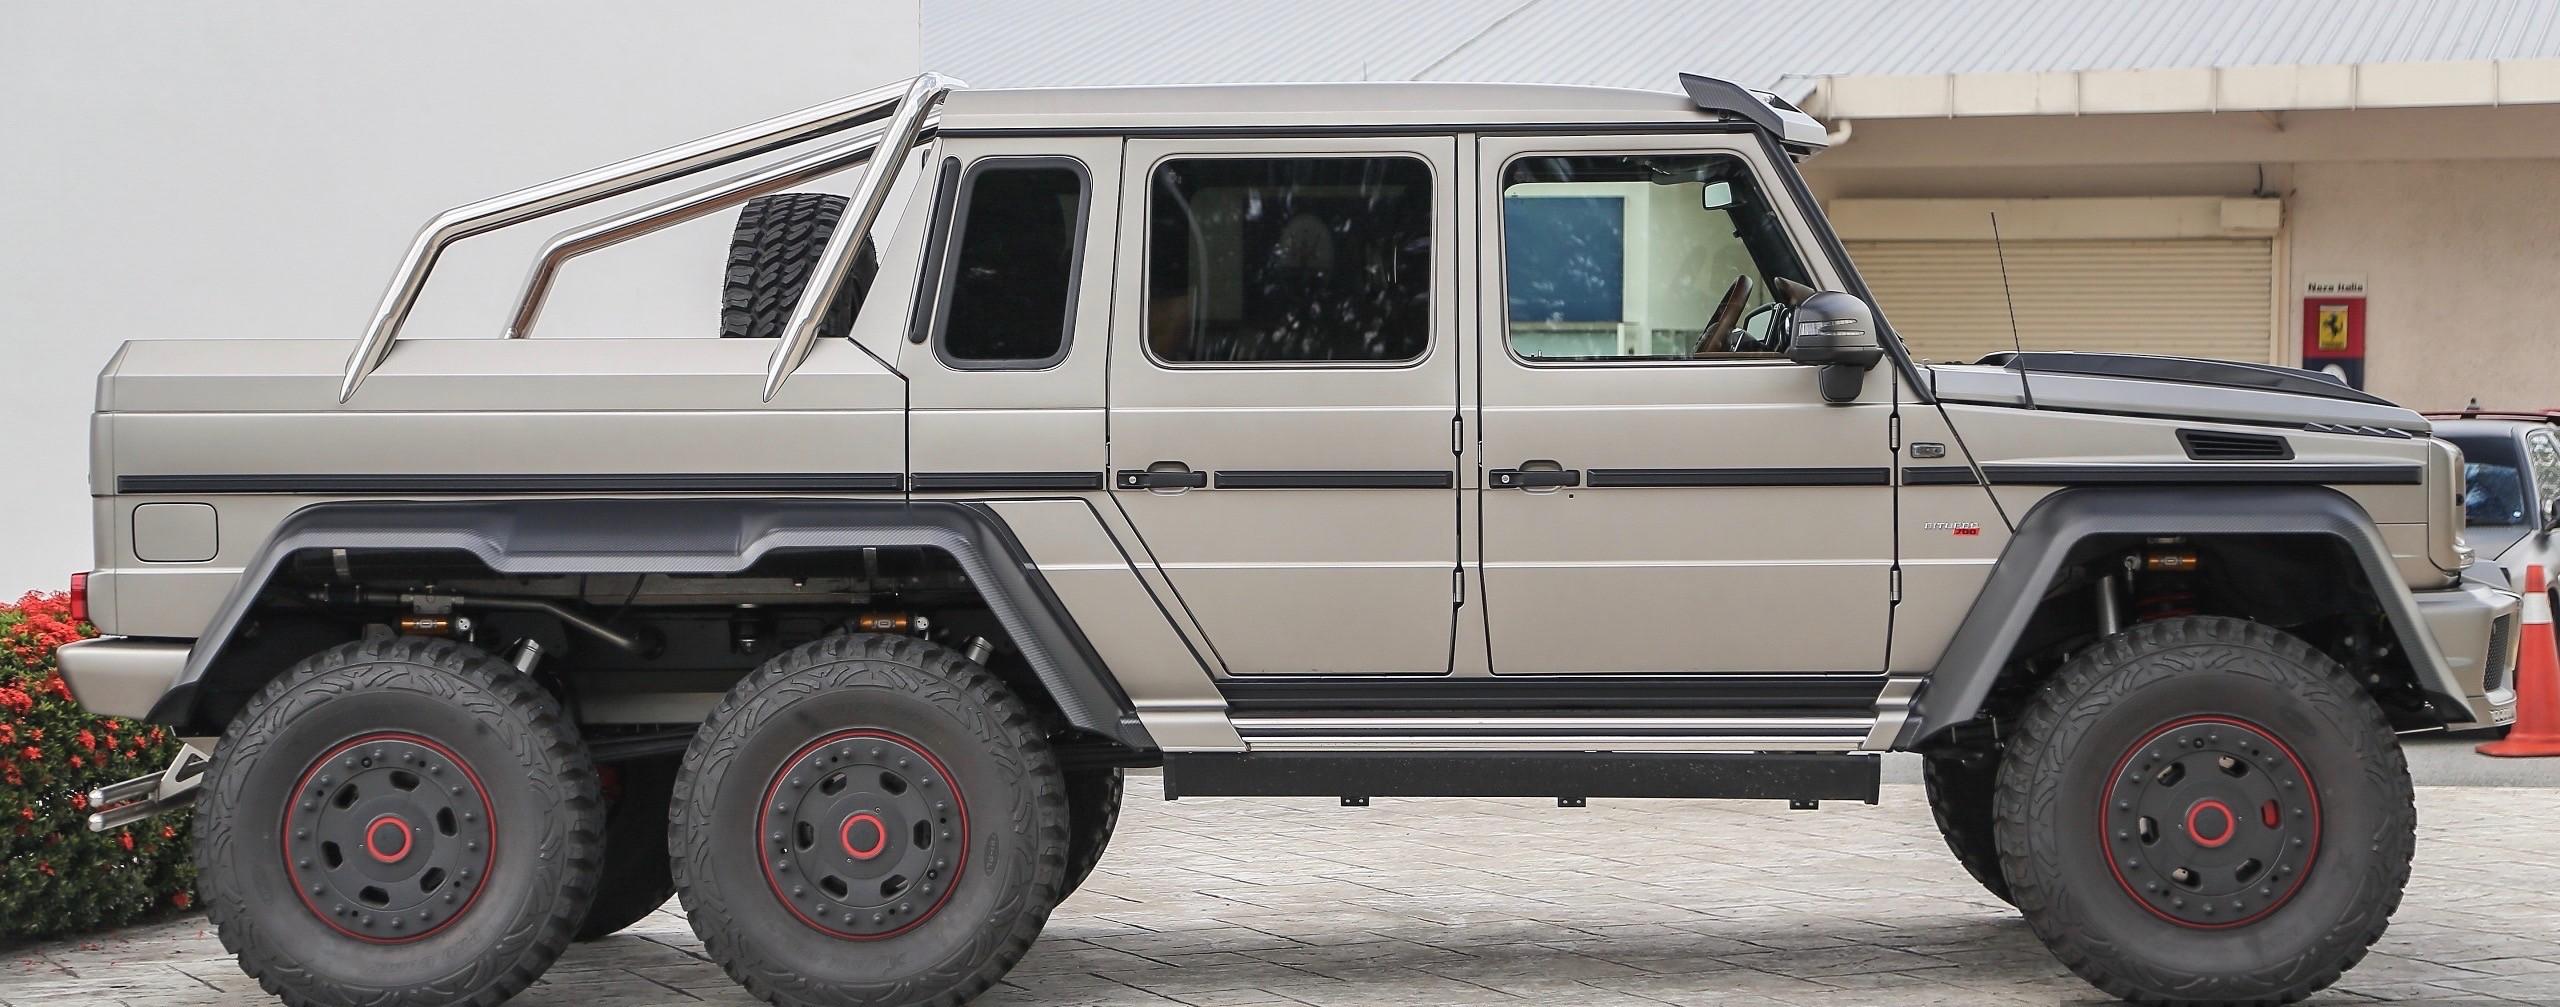 Mercedes Brabus G700 B63 S 6x6 Luxury Pulse Cars Germany For Sale On Luxurypulse